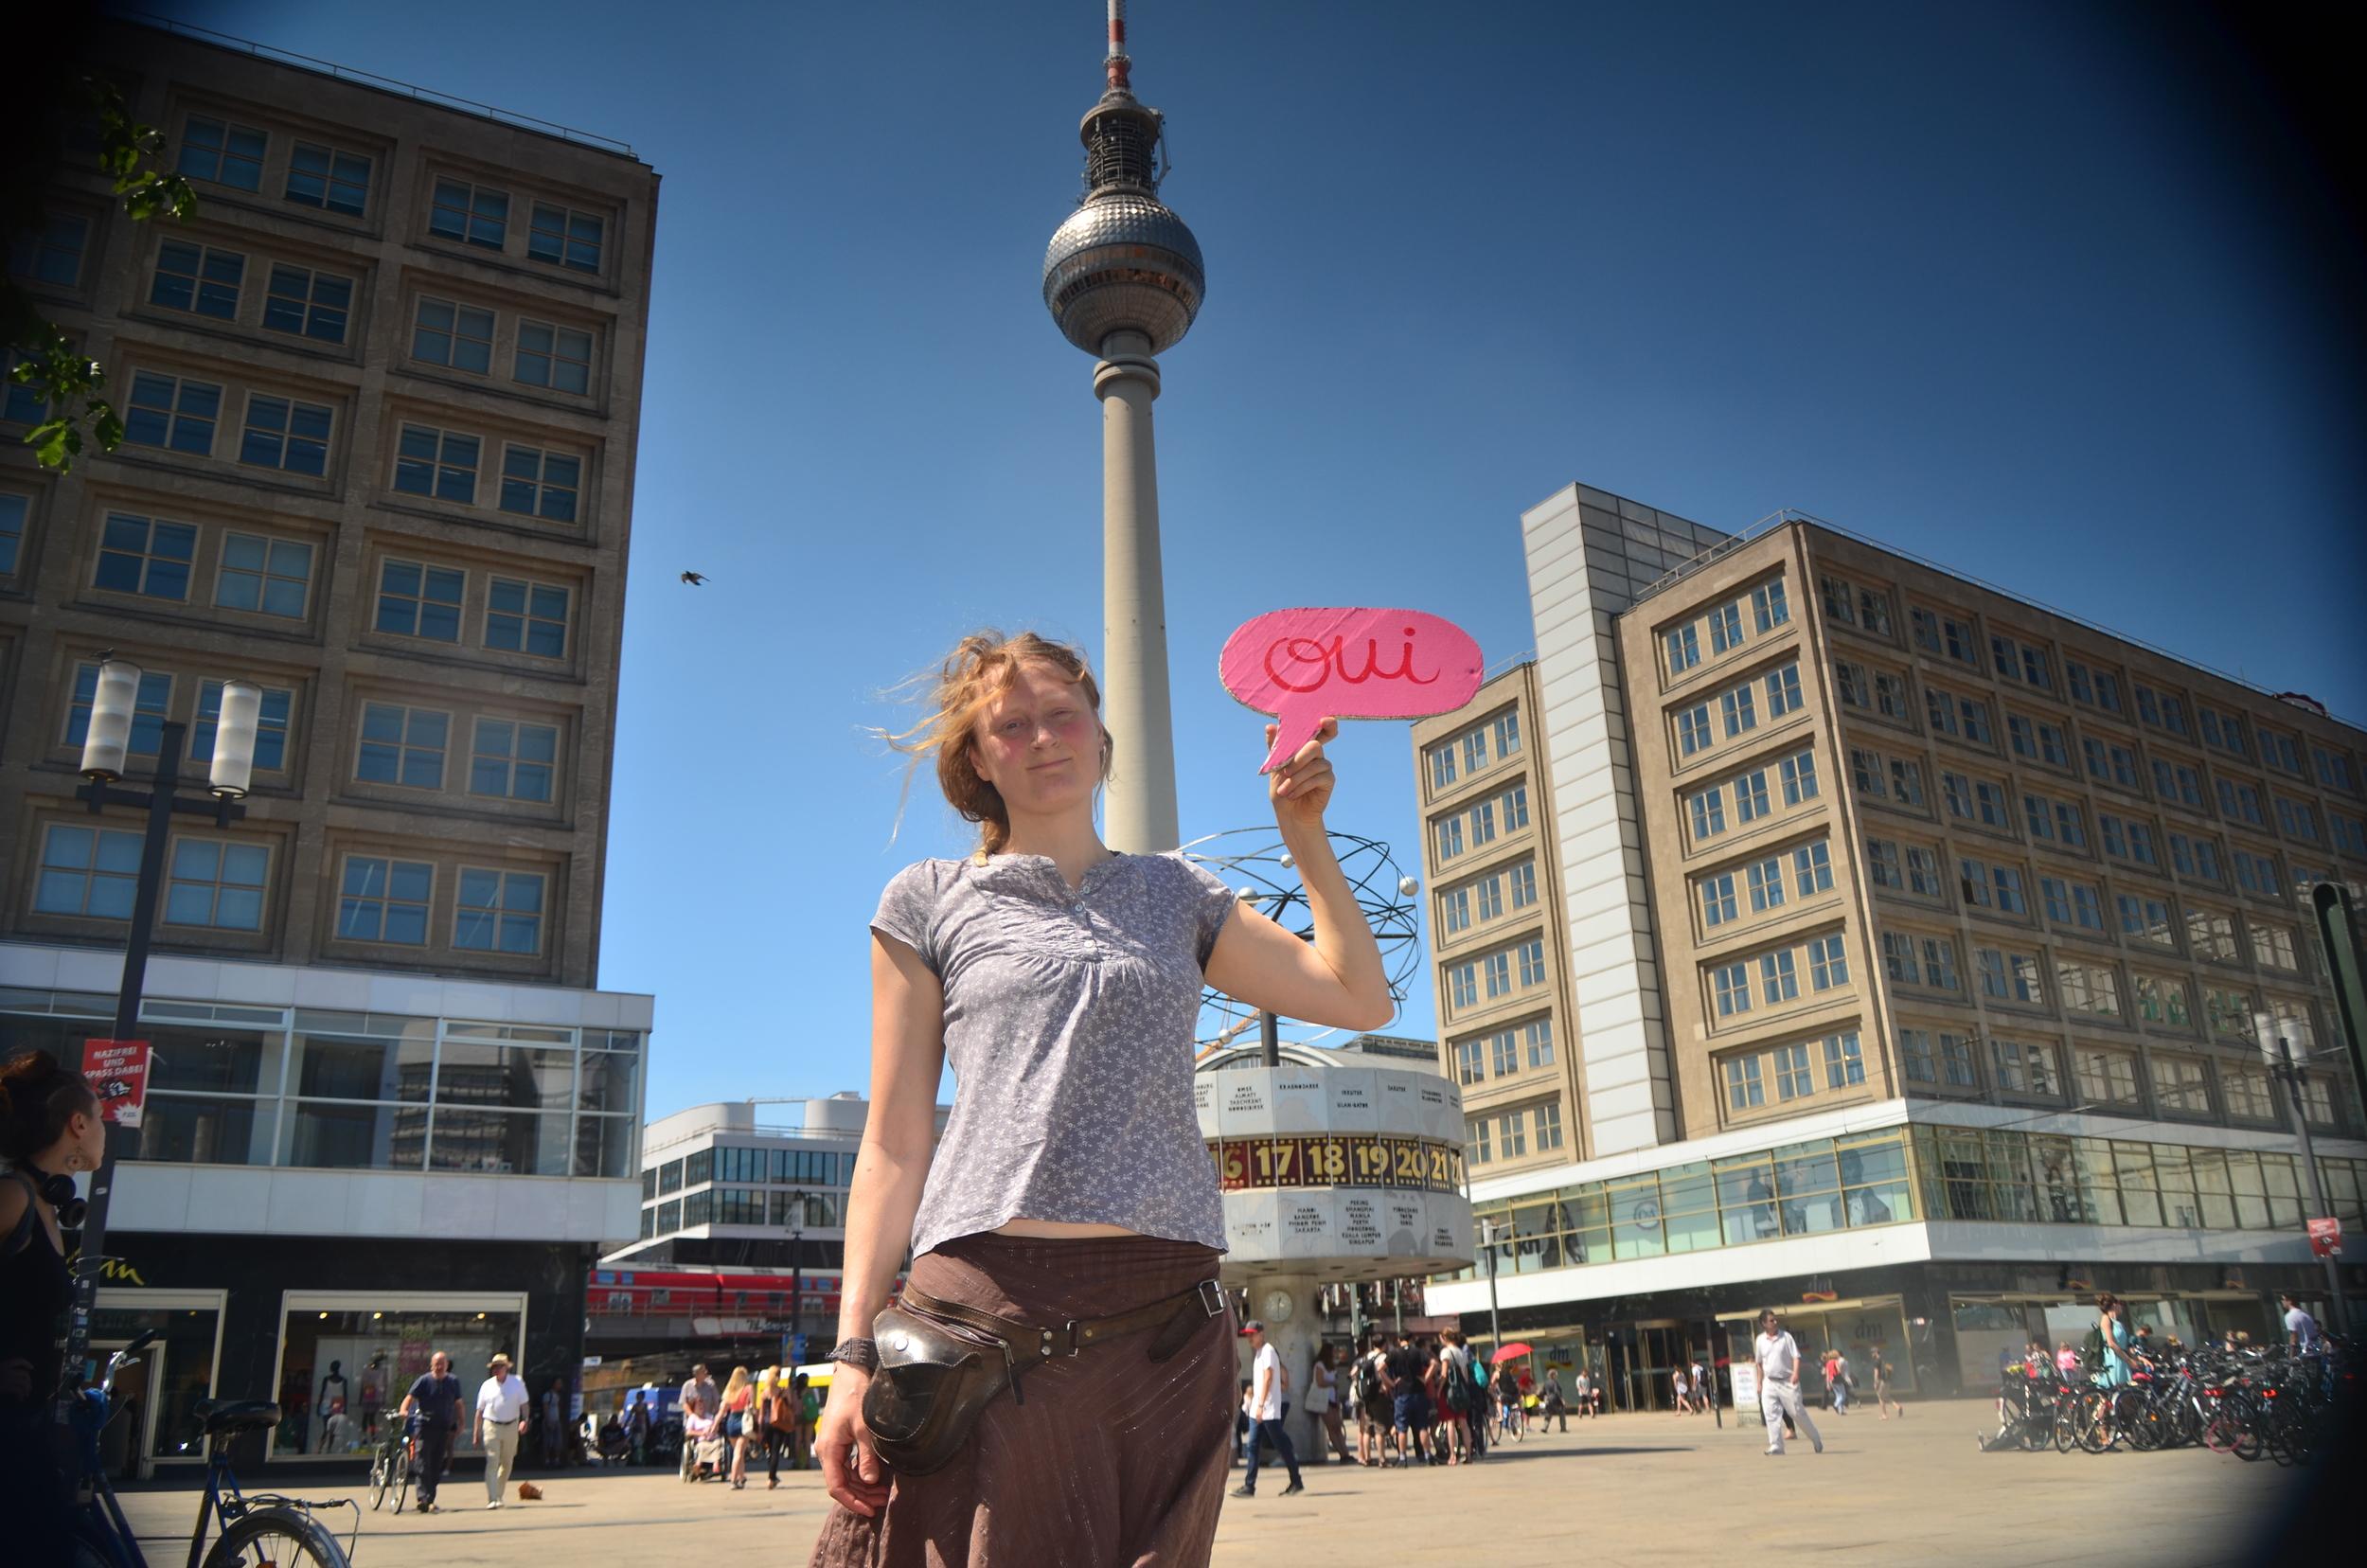 …passing Berlin, greetings from Alexanderplatz